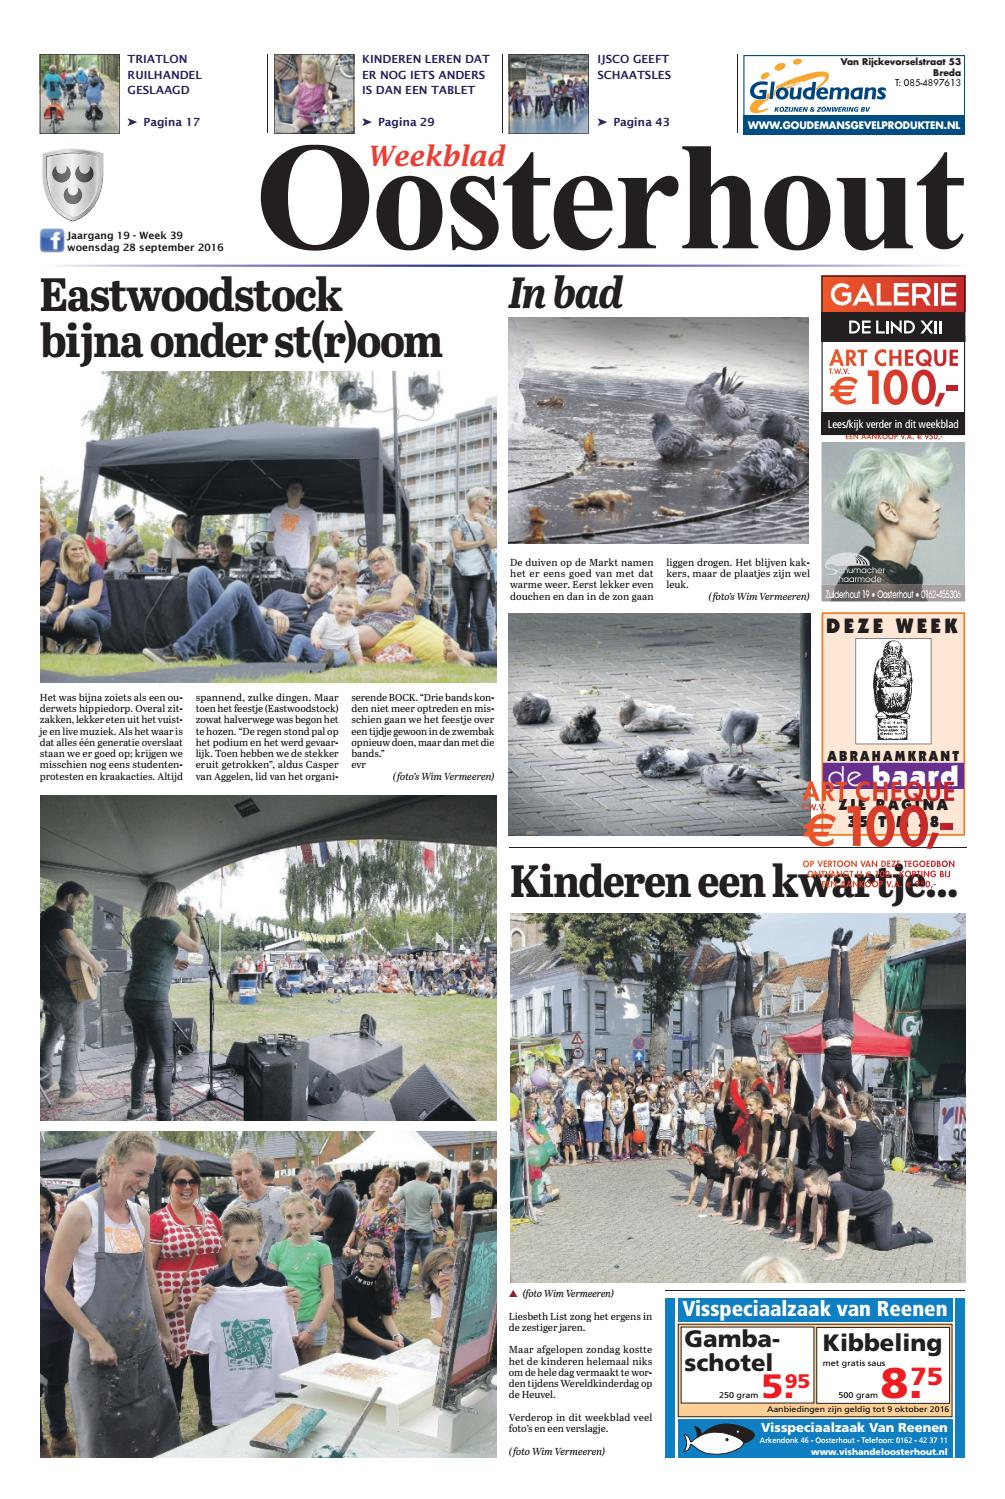 Weekblad oosterhout 28 09 2016 by uitgeverij em de jong   issuu